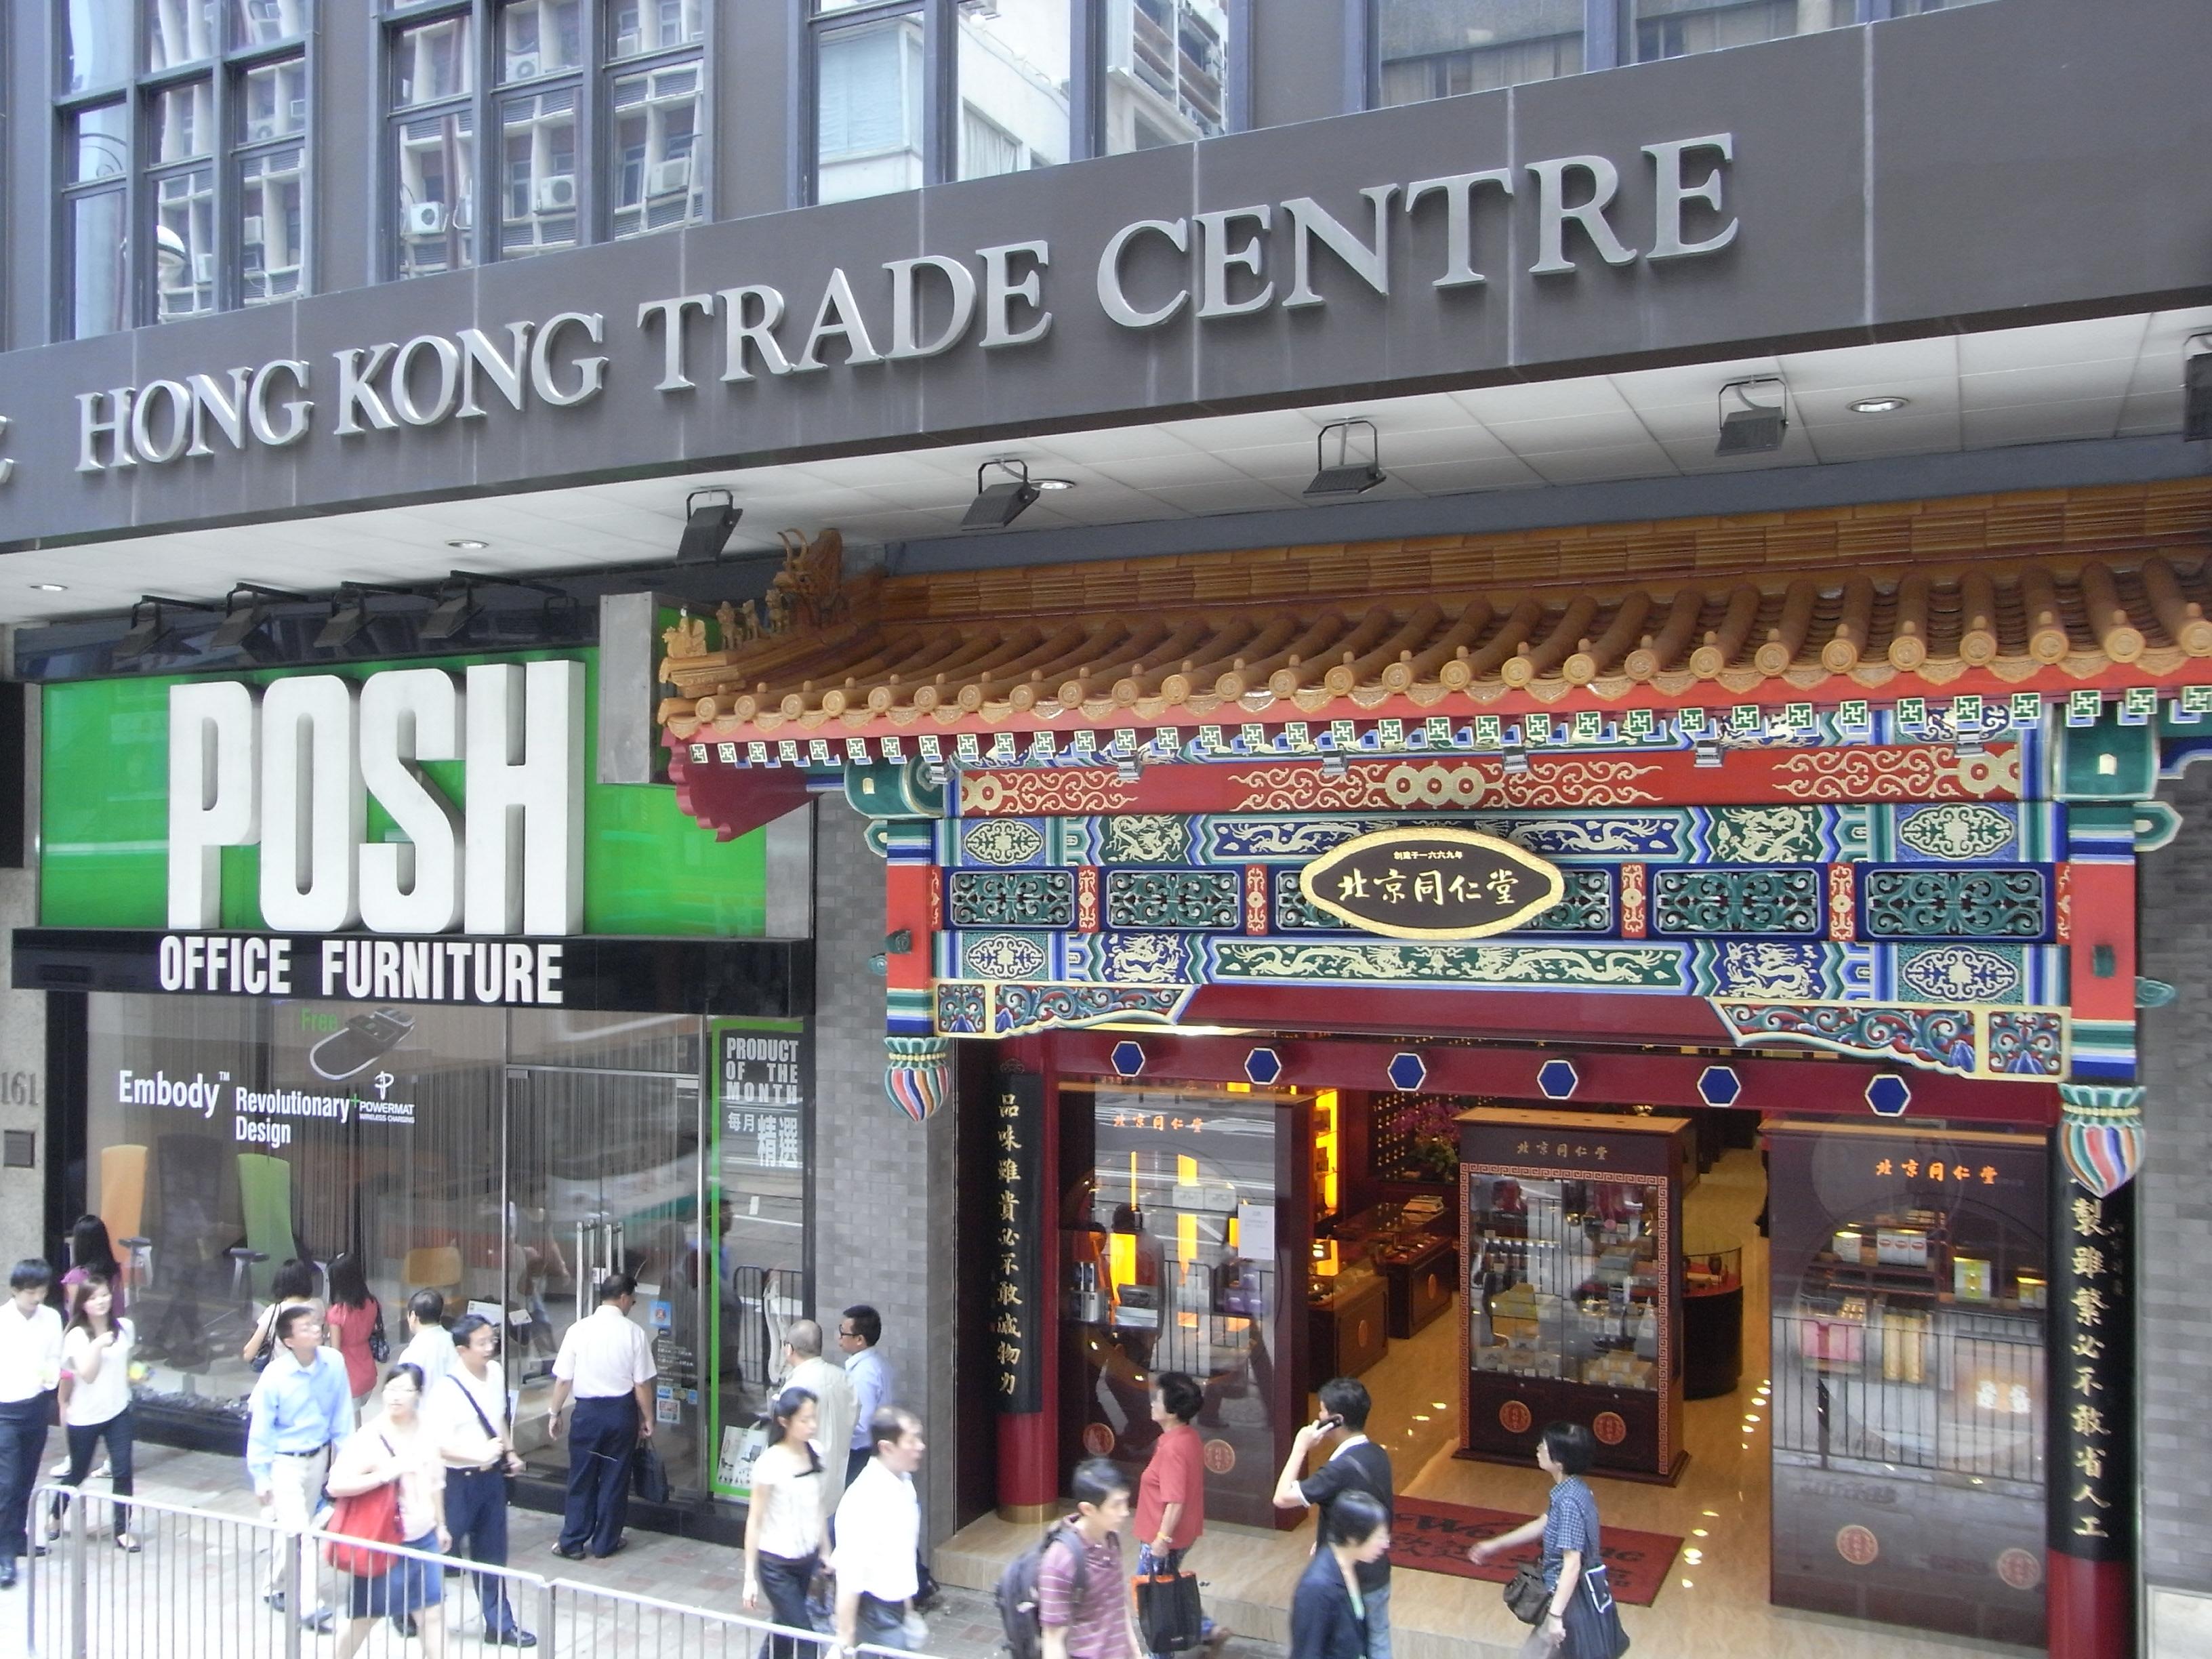 posh office furniture. File:HK Central Des Voeux Road 北京同仁堂 Beijing Tongrentang Hong Kong Trade Centre POSH Posh Office Furniture E